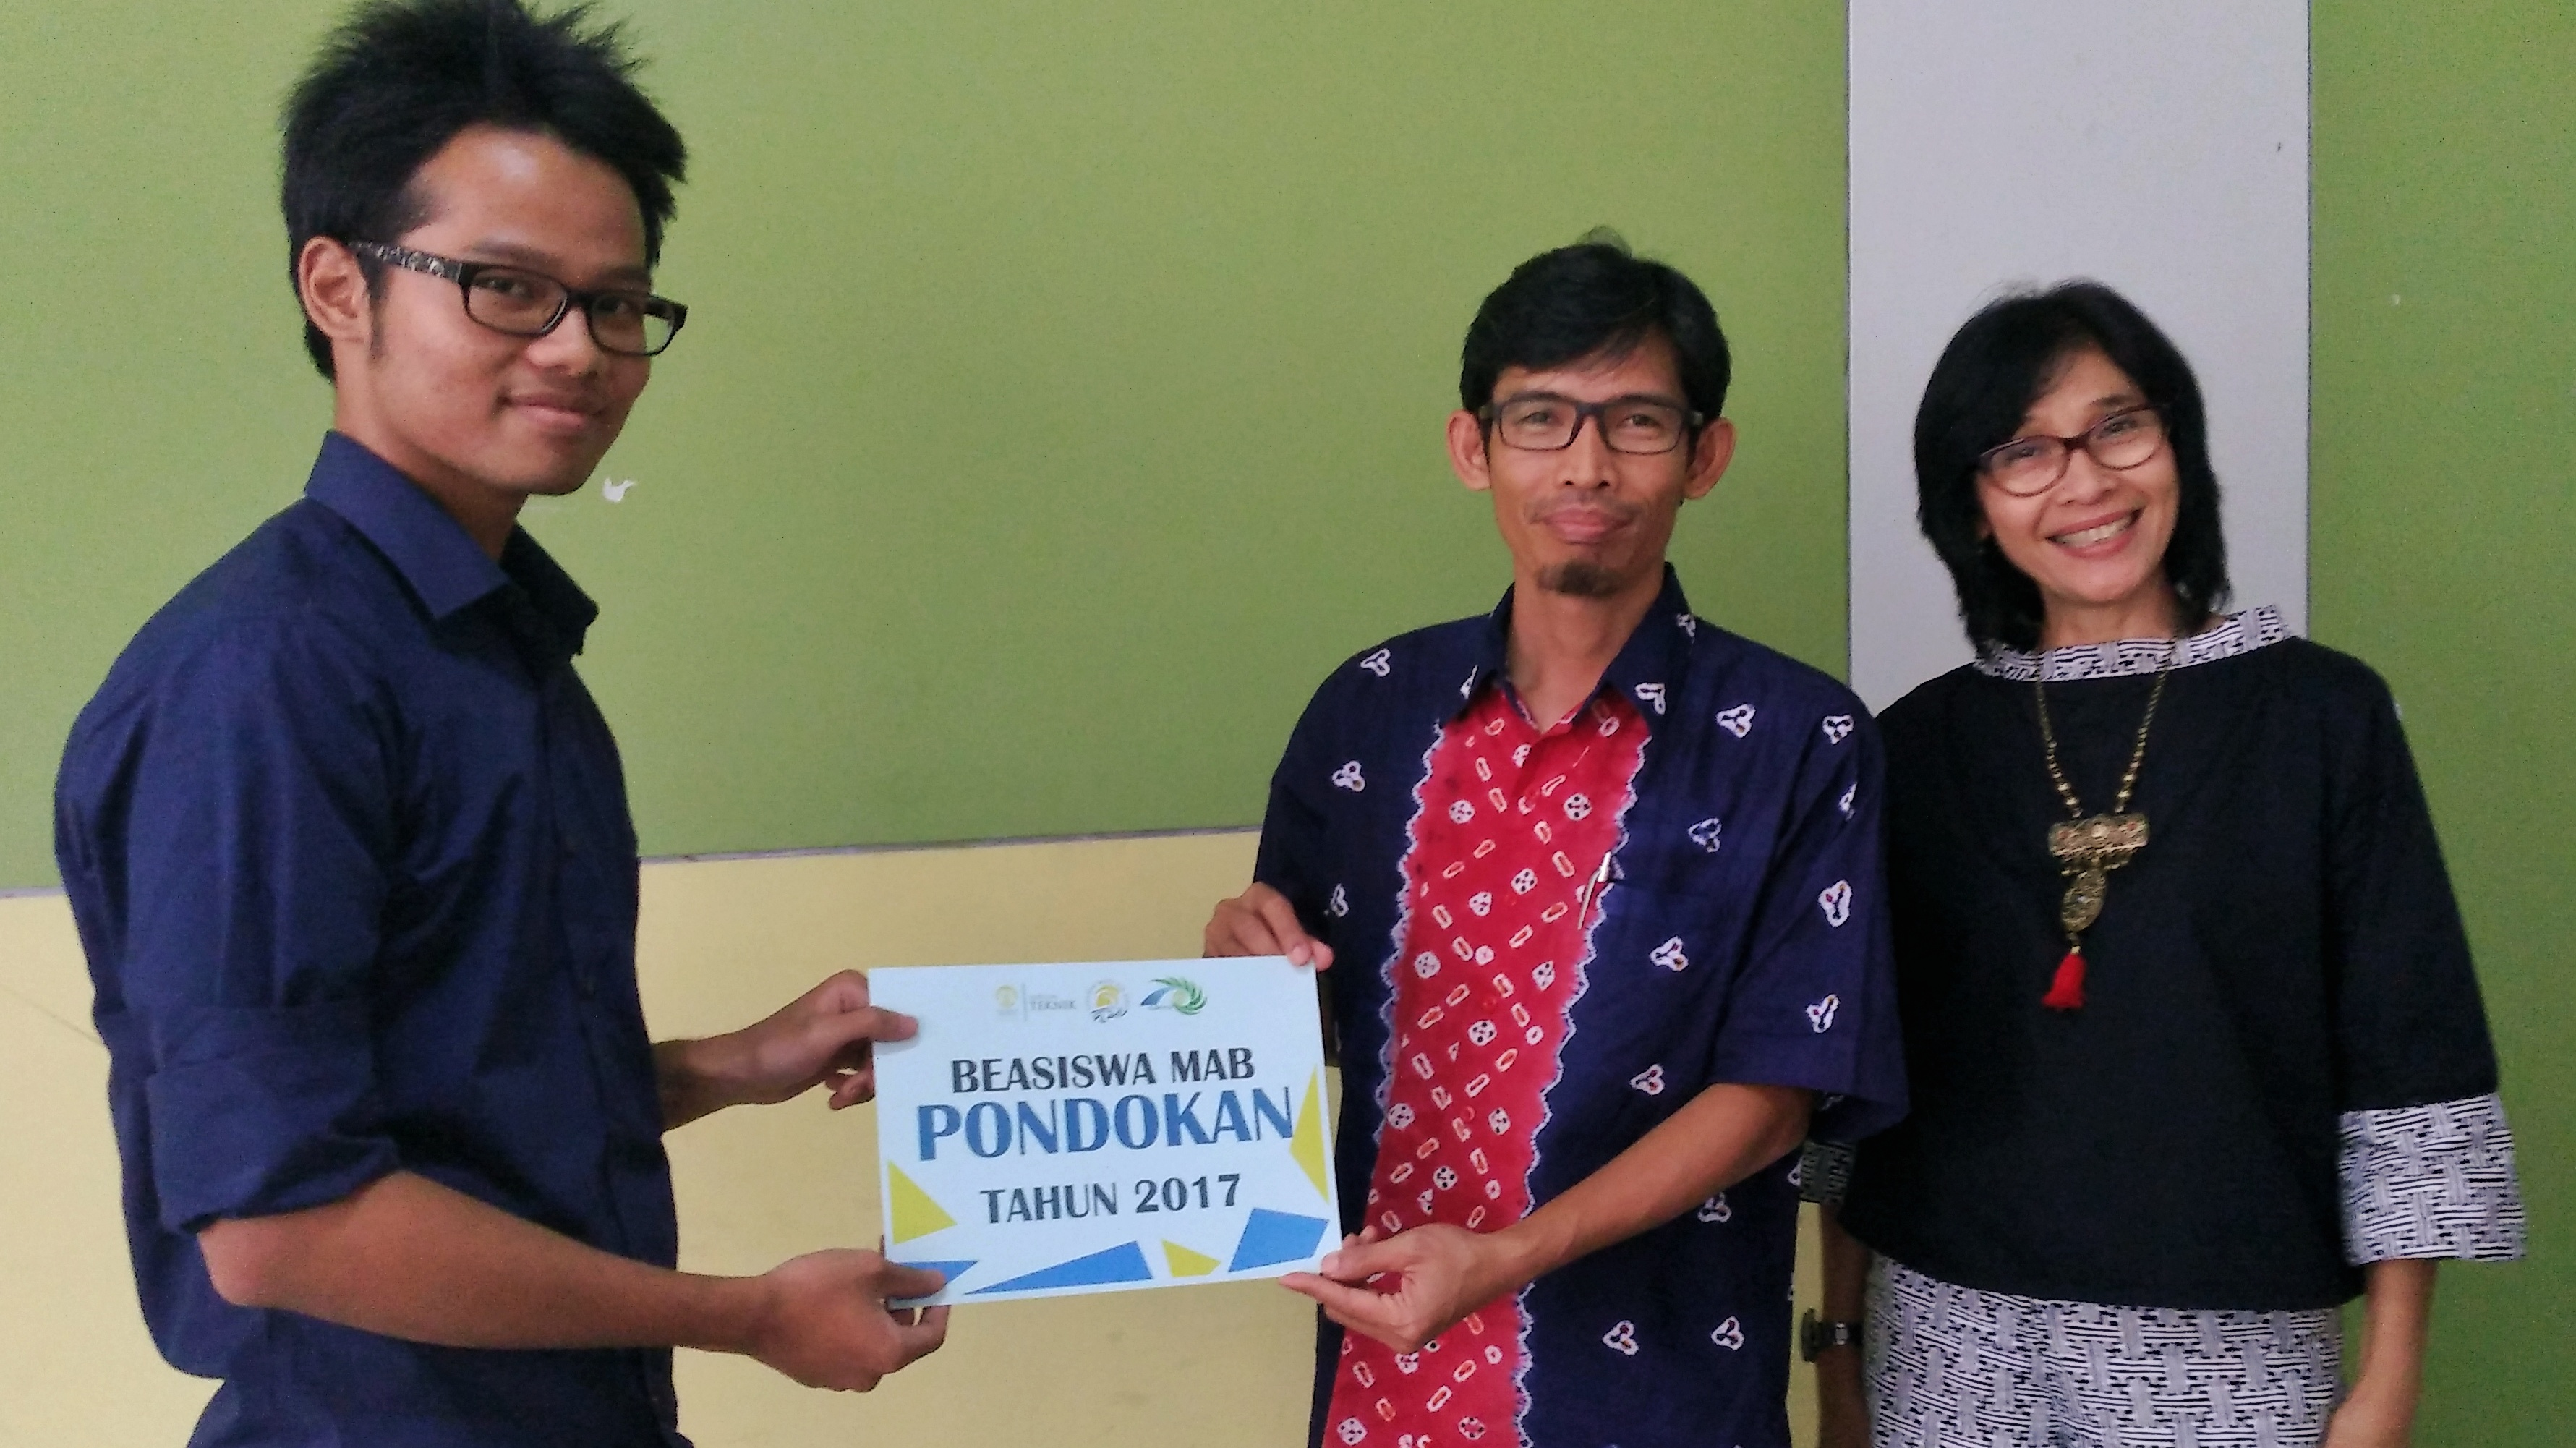 Perwakilan Penerima Beasiswa Pondokan Putra-Ikhsan Firdauz (Teknik Komputer 2017)